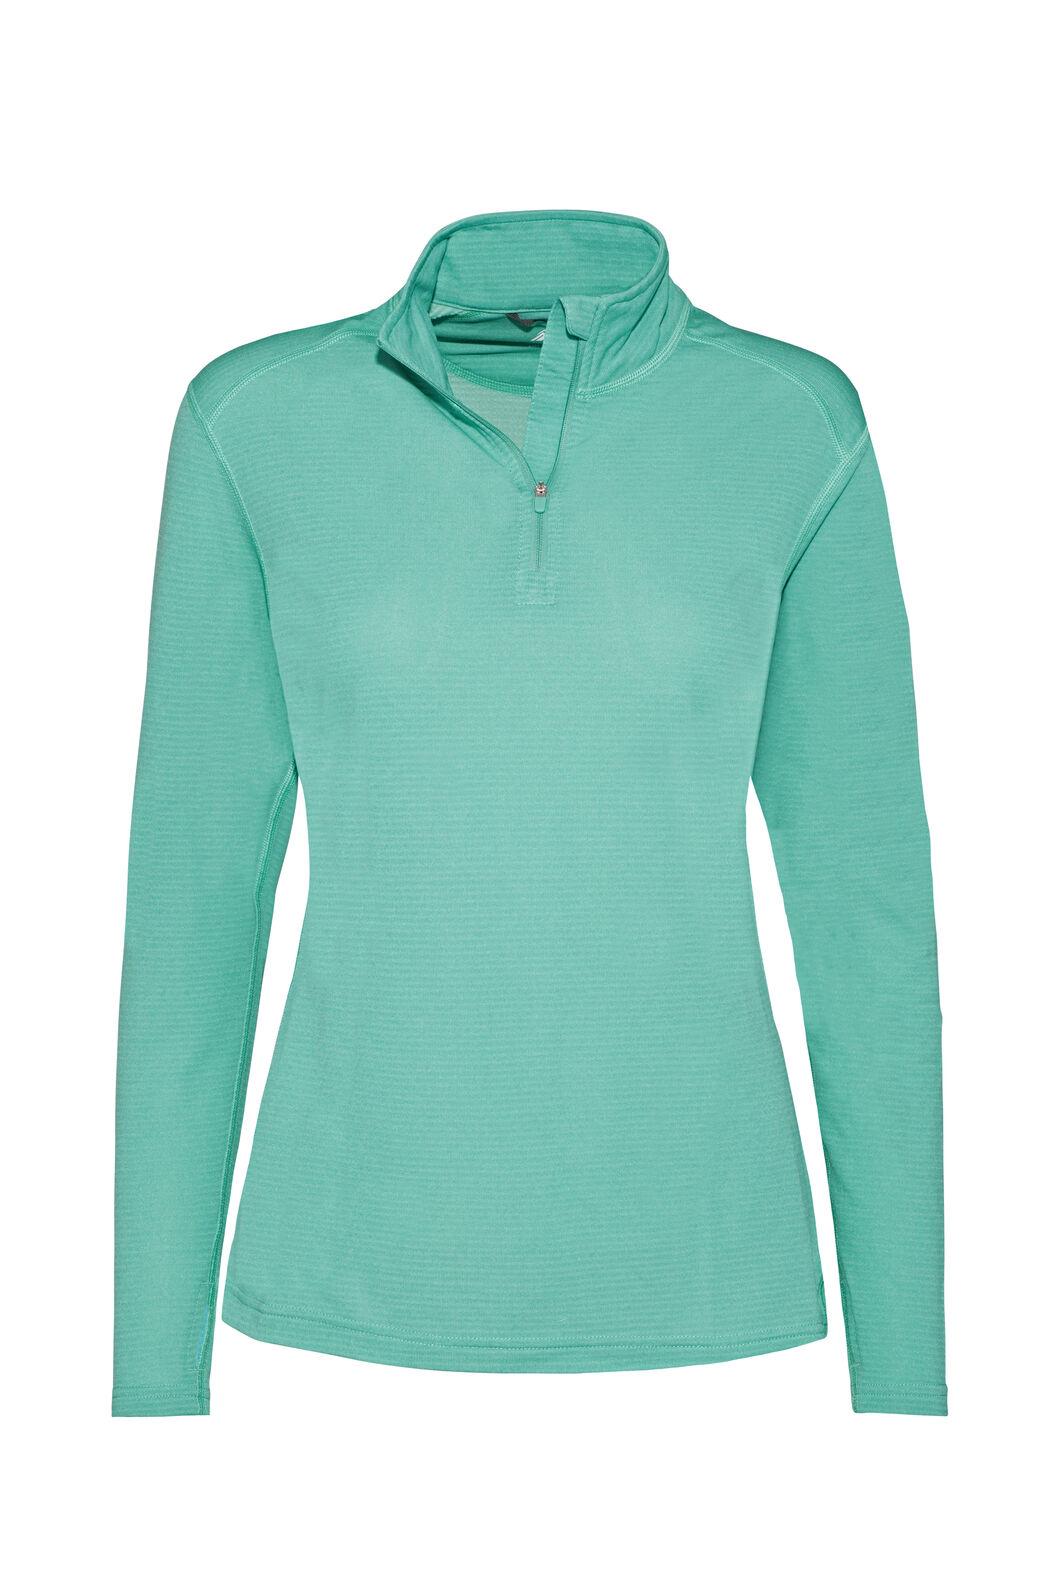 Macpac Prothermal Polartec® Long Sleeve Top — Women's, Columbia, hi-res